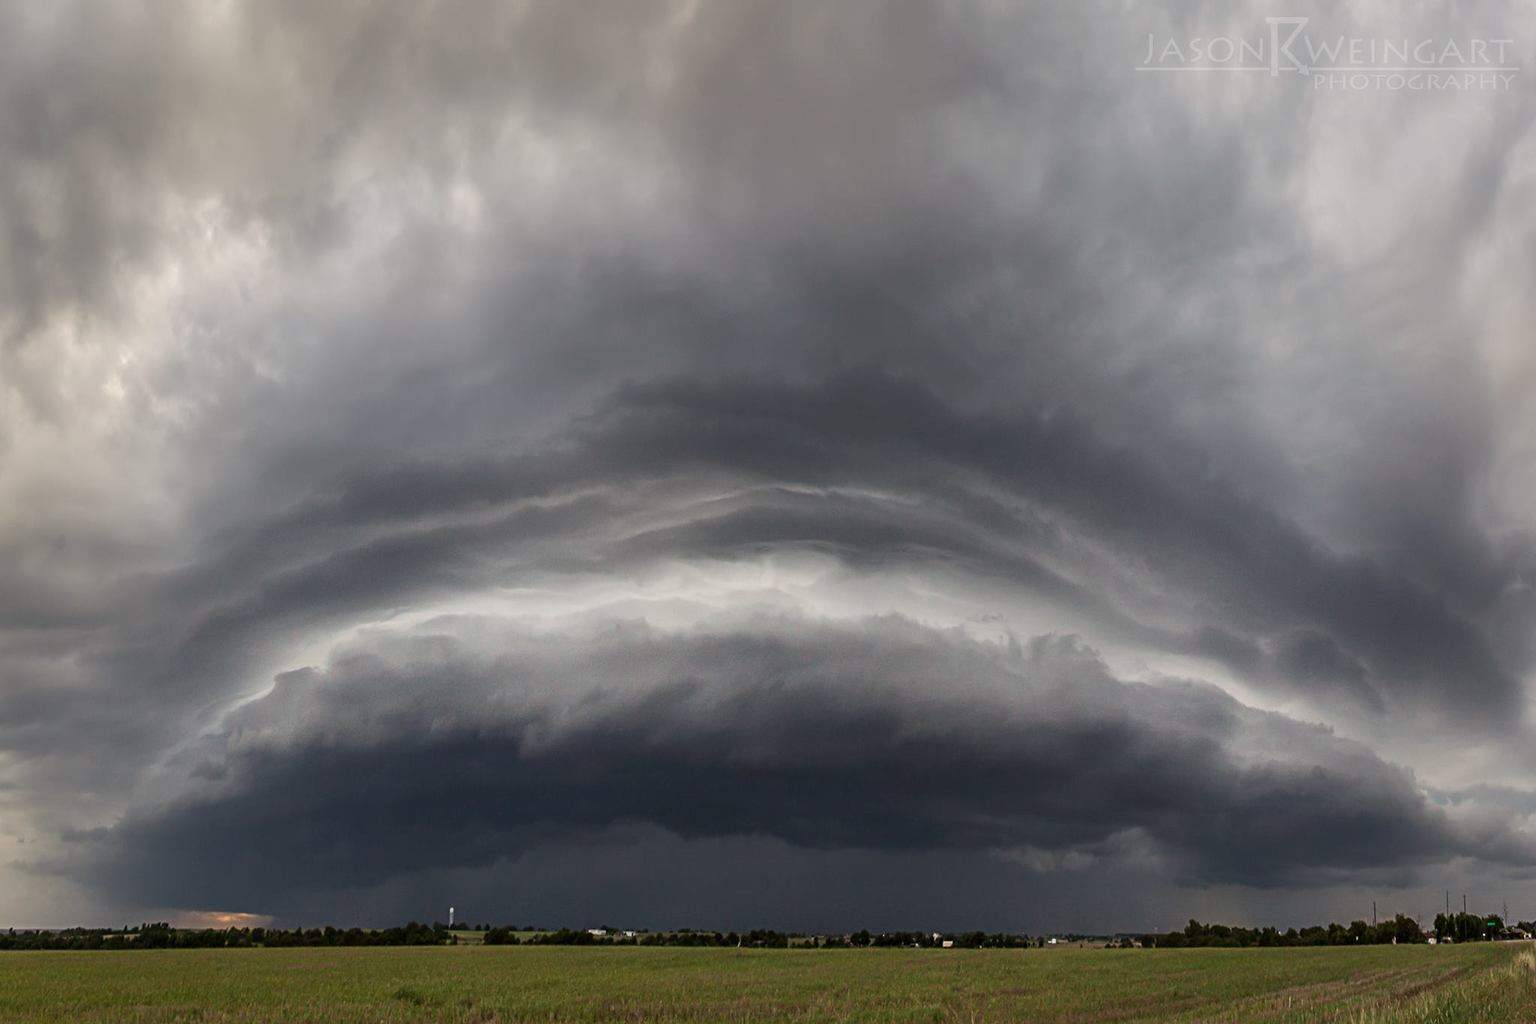 Five image panorama of a shelf cloud near Salado, Tx. 06.18.15 f/10.0 1/160th second ISO 200